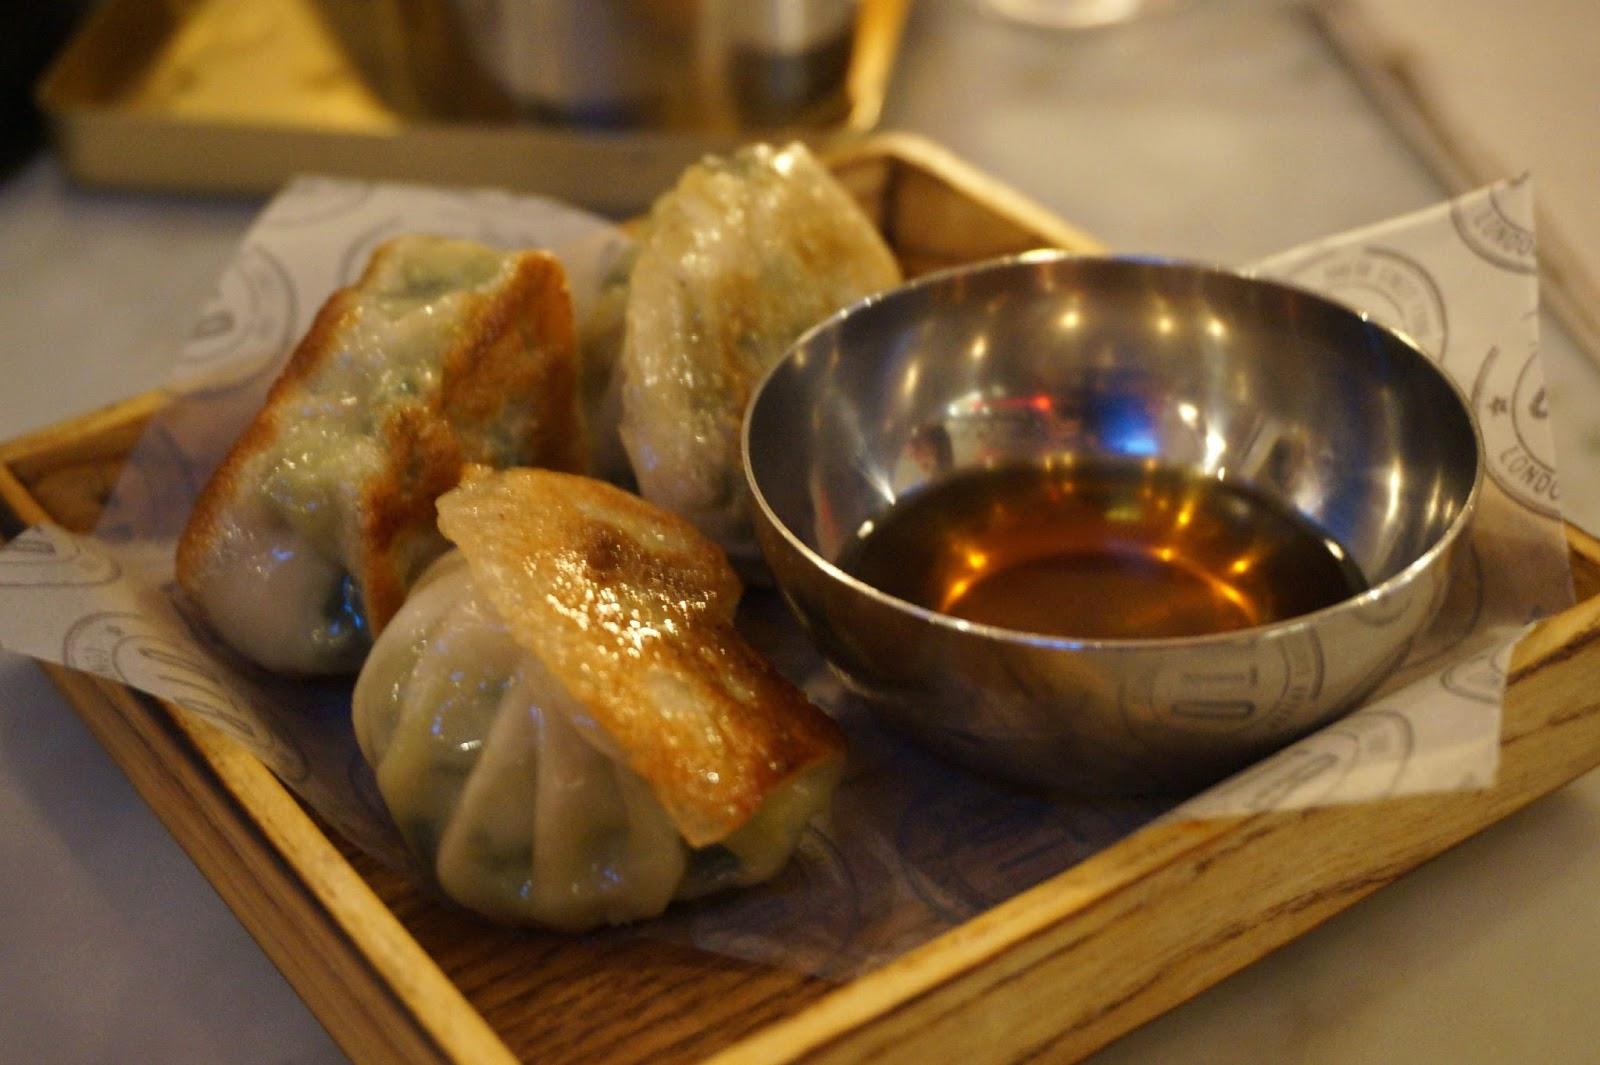 Korean steamed dumplings